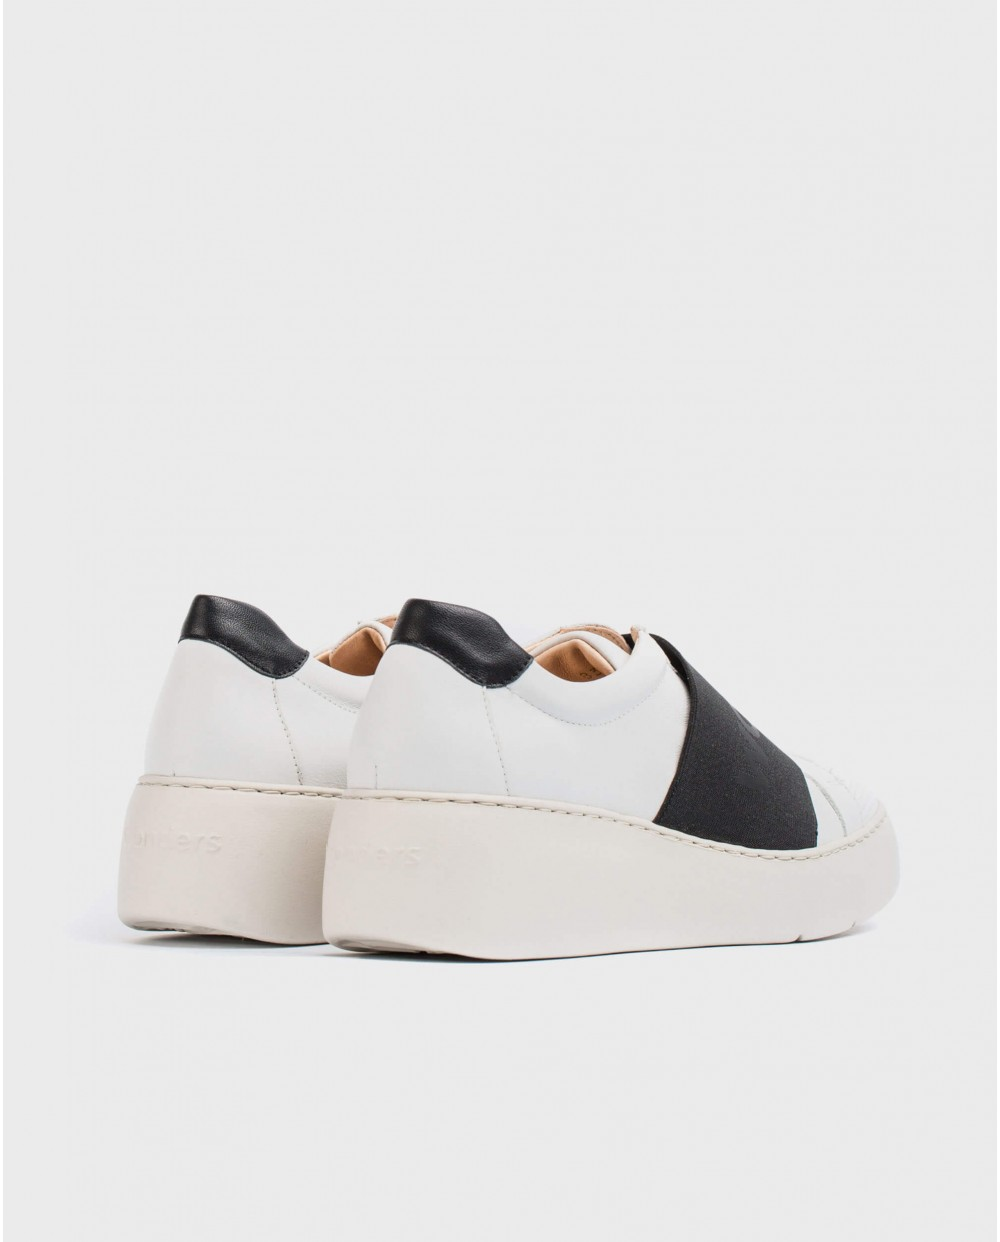 Wonders-Sneakers-Leather sneaker with elastic band